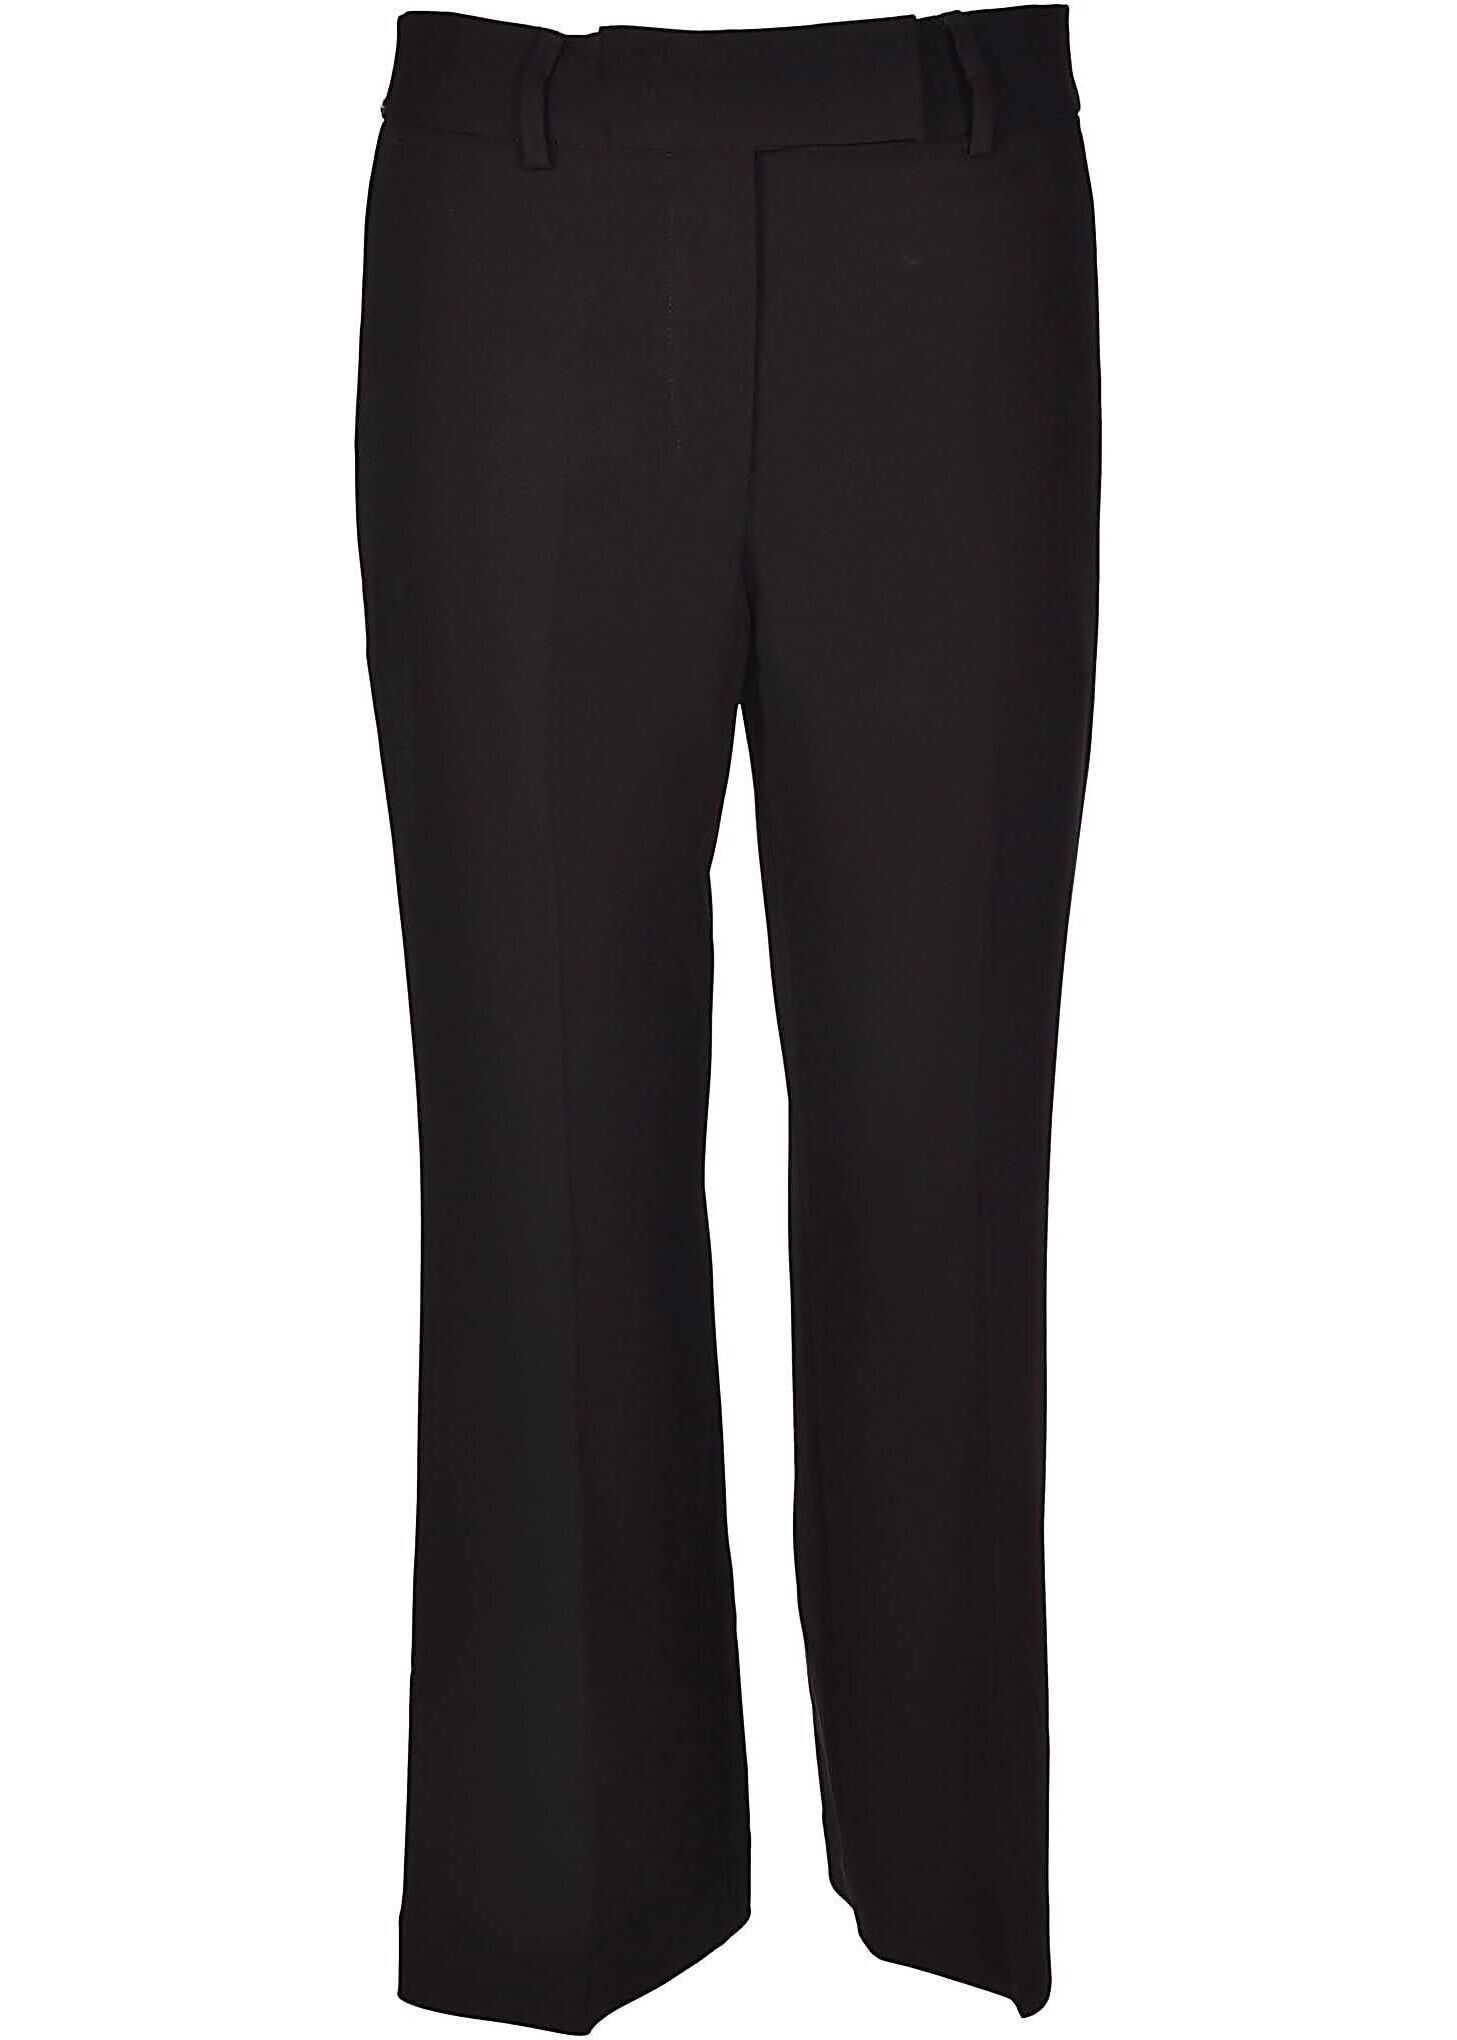 Michael Kors Viscose Pants BLACK